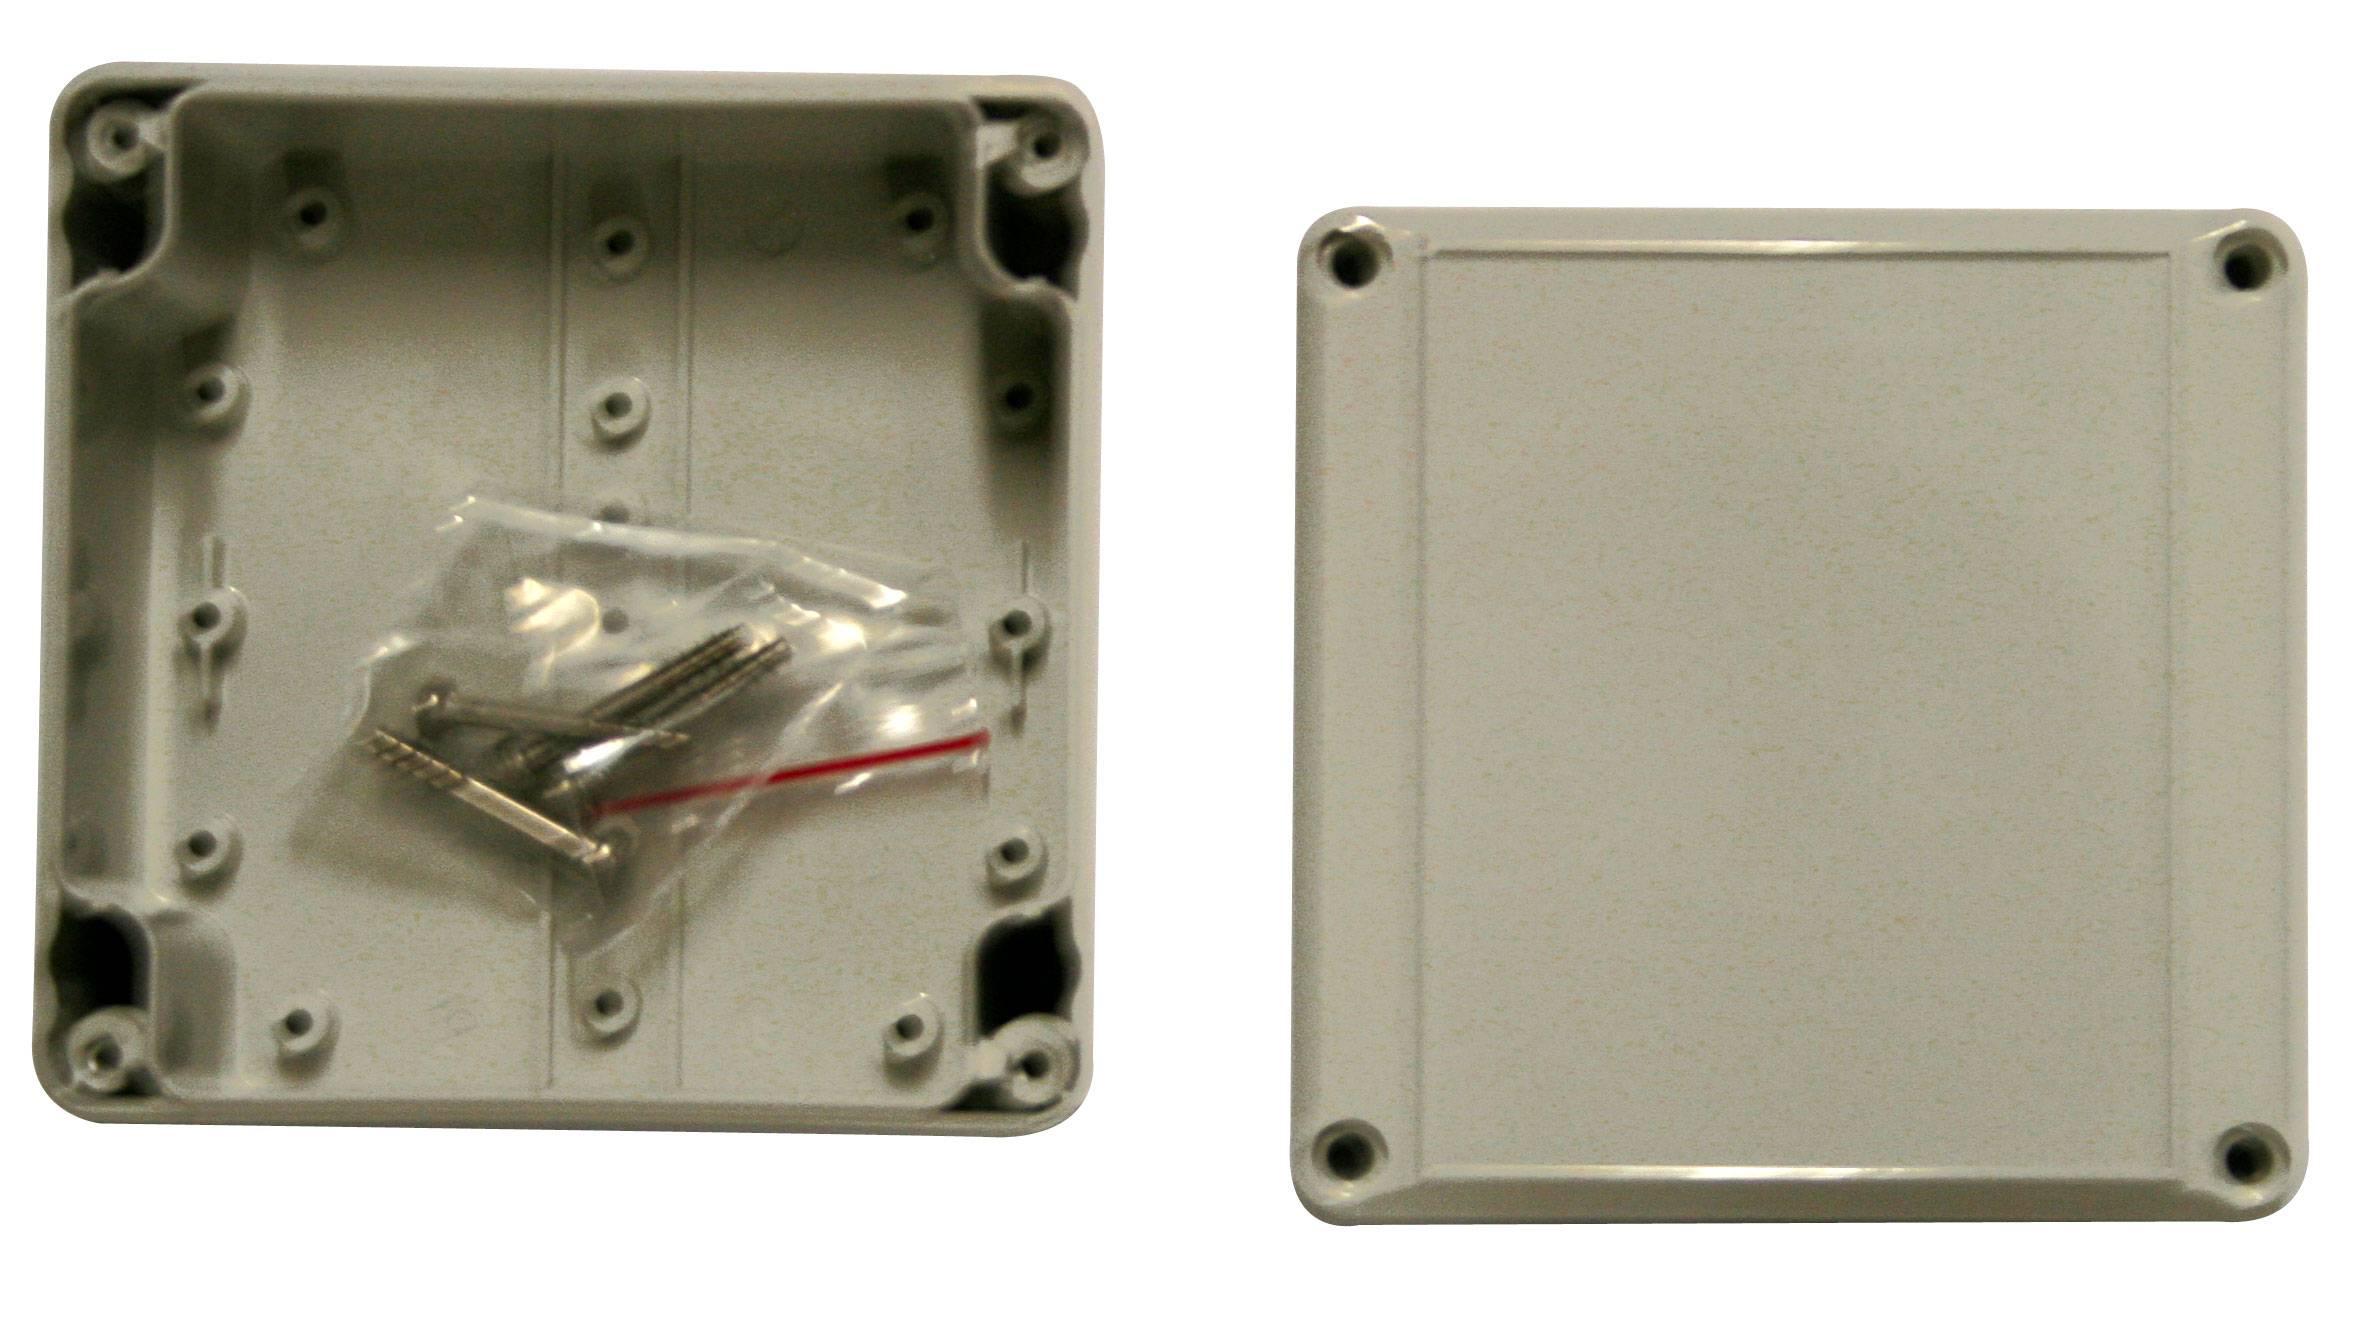 Pouzdro na regulátor stavu hladiny vodivých kapalin 12/24 V B+B Thermo-Technik Neopracované pouzdro na regulátor stavu hladiny 12/24 V/DC